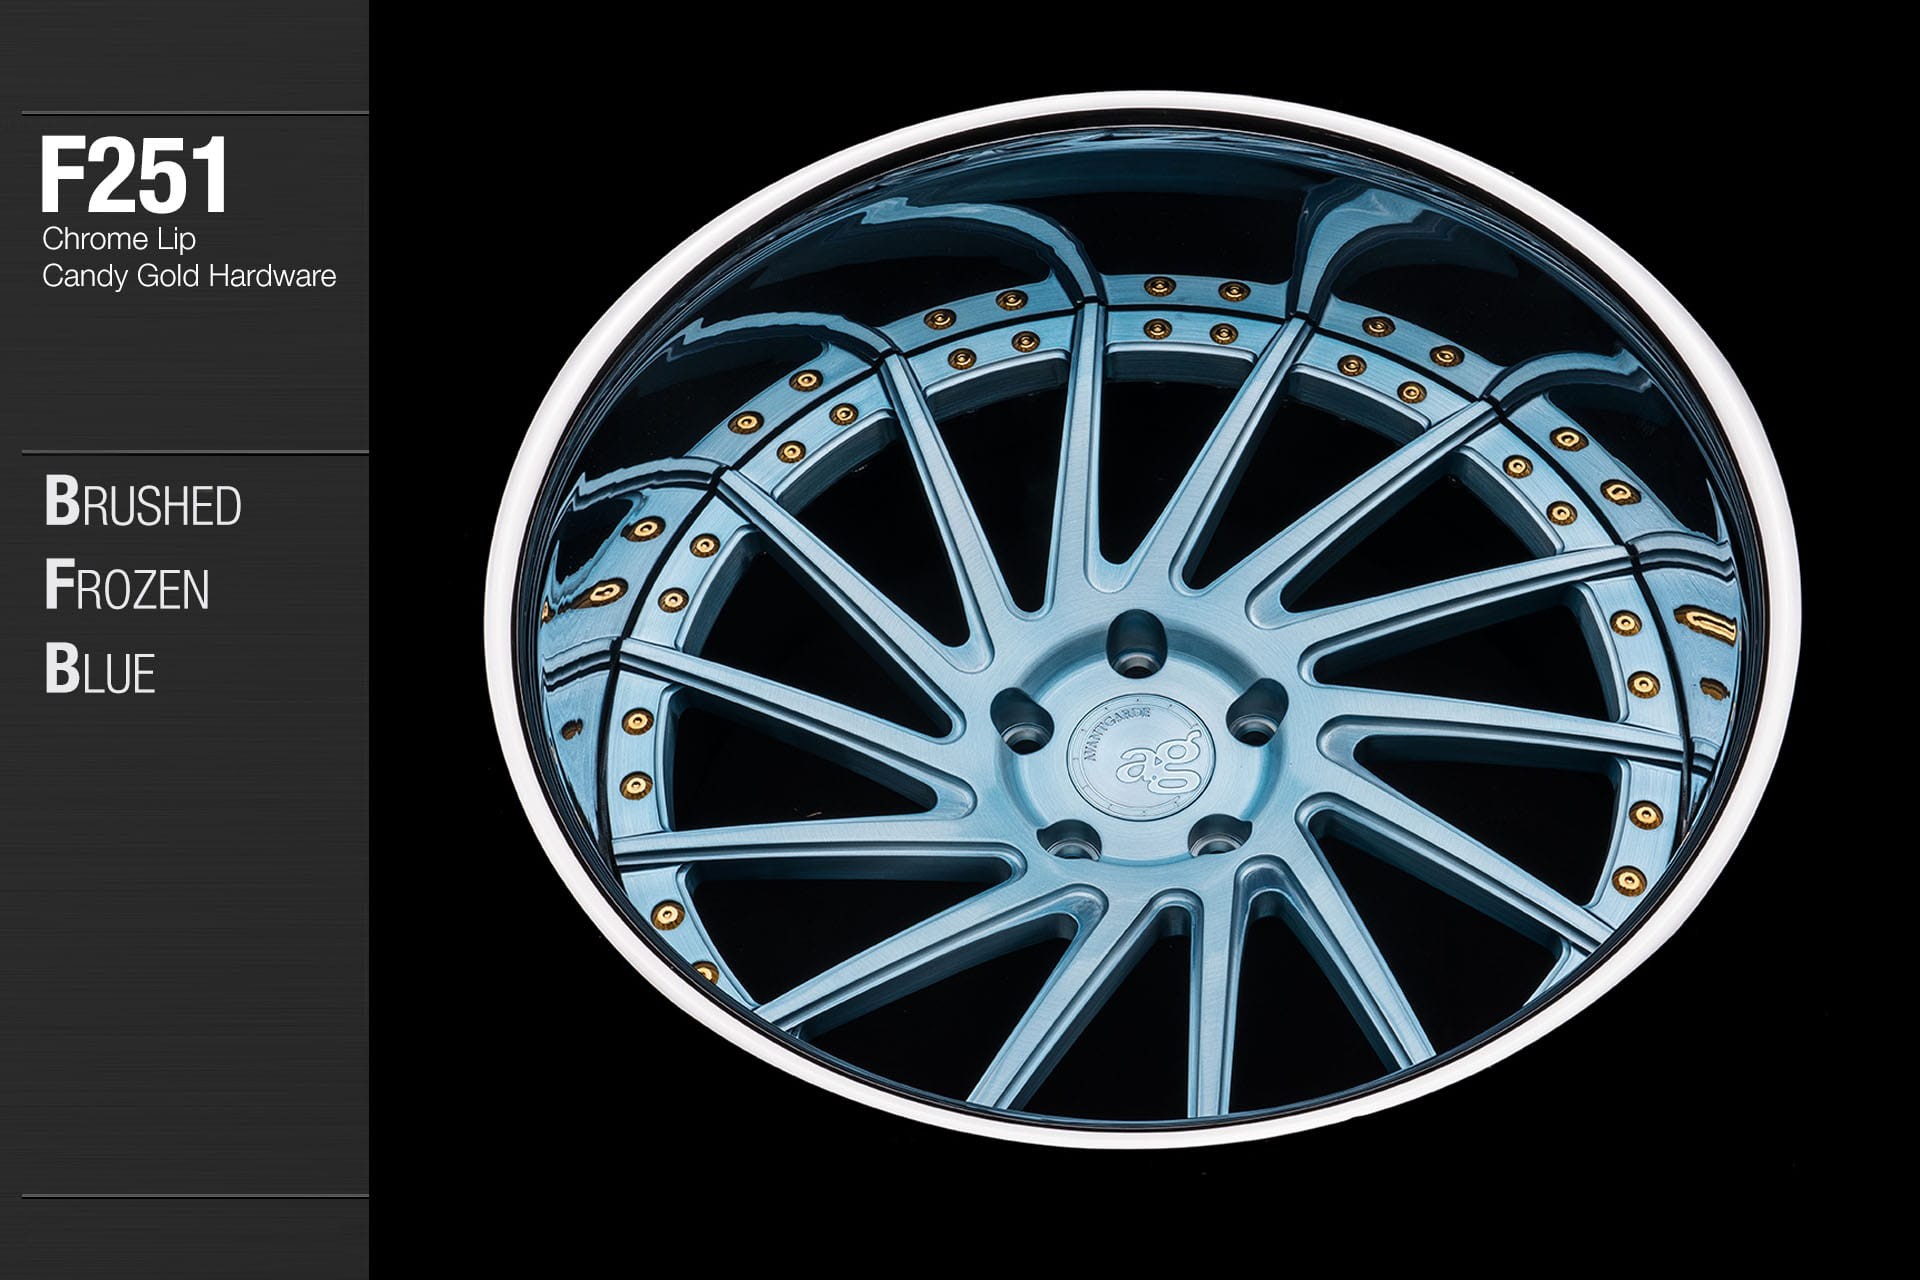 avant-garde-ag-wheels-f251-brushed-frozen-blue-face-chrome-lip-candy-gold-hardware-3-min